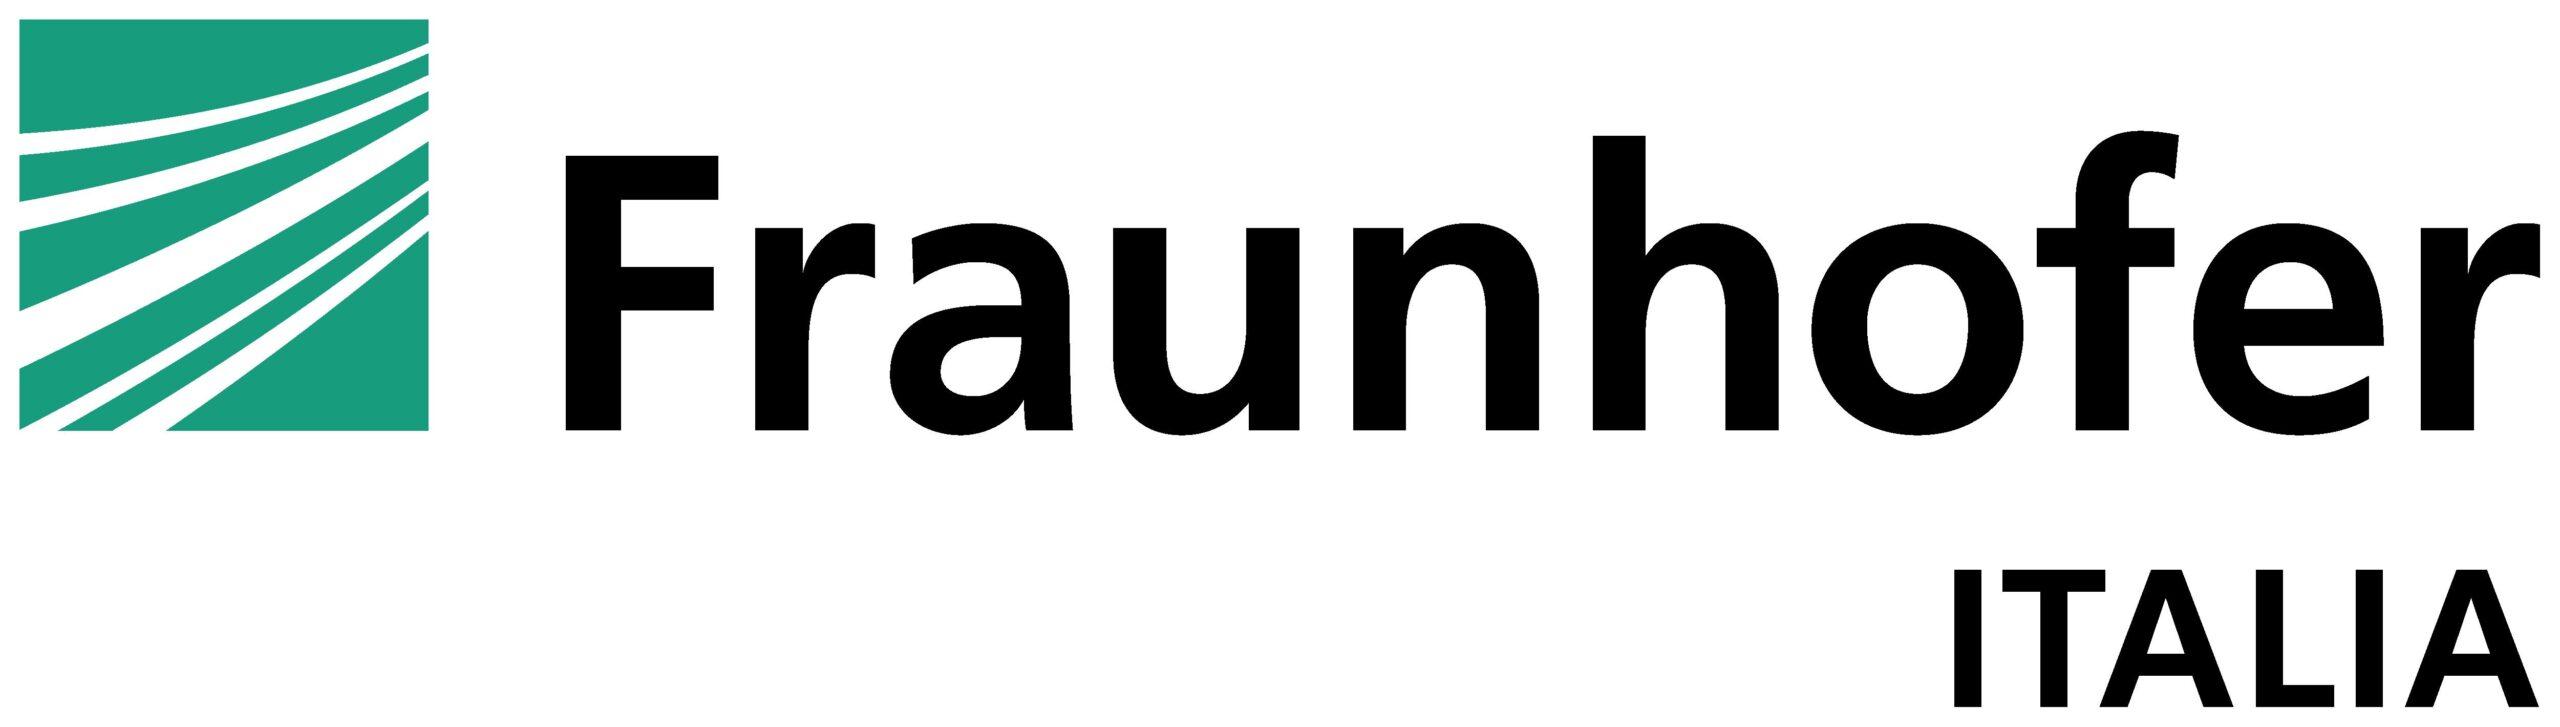 Fraunhofer-Italia-Research-Scarl-logo